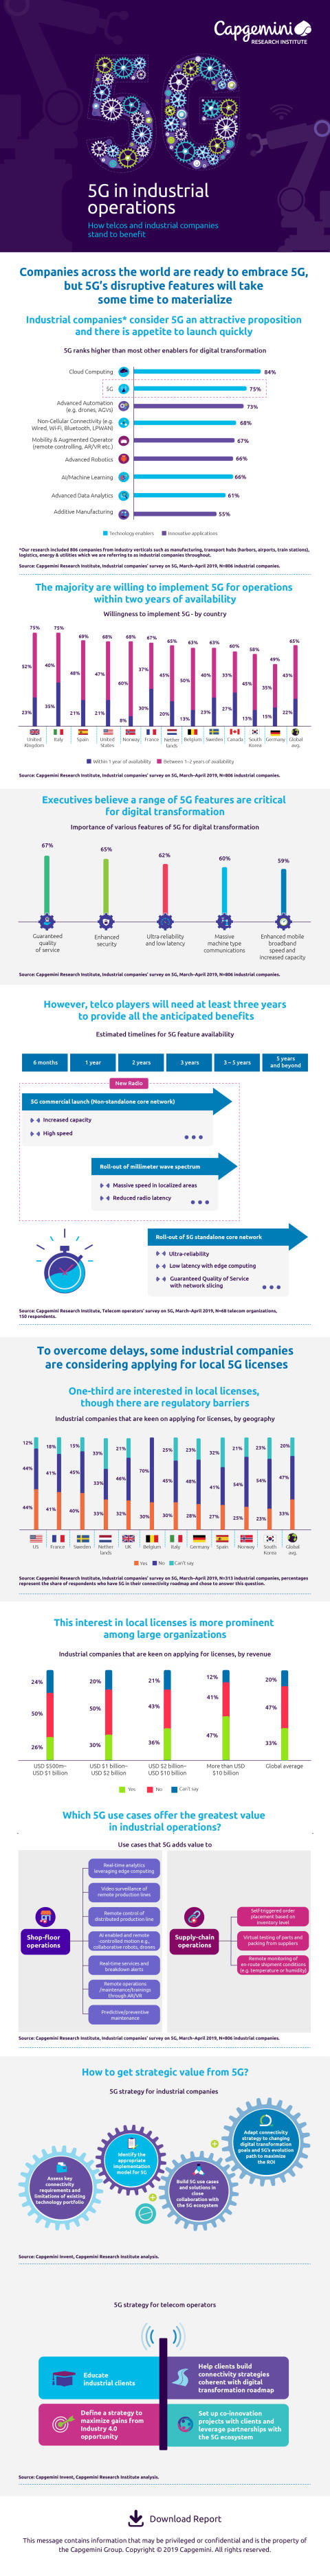 Infographic 5G